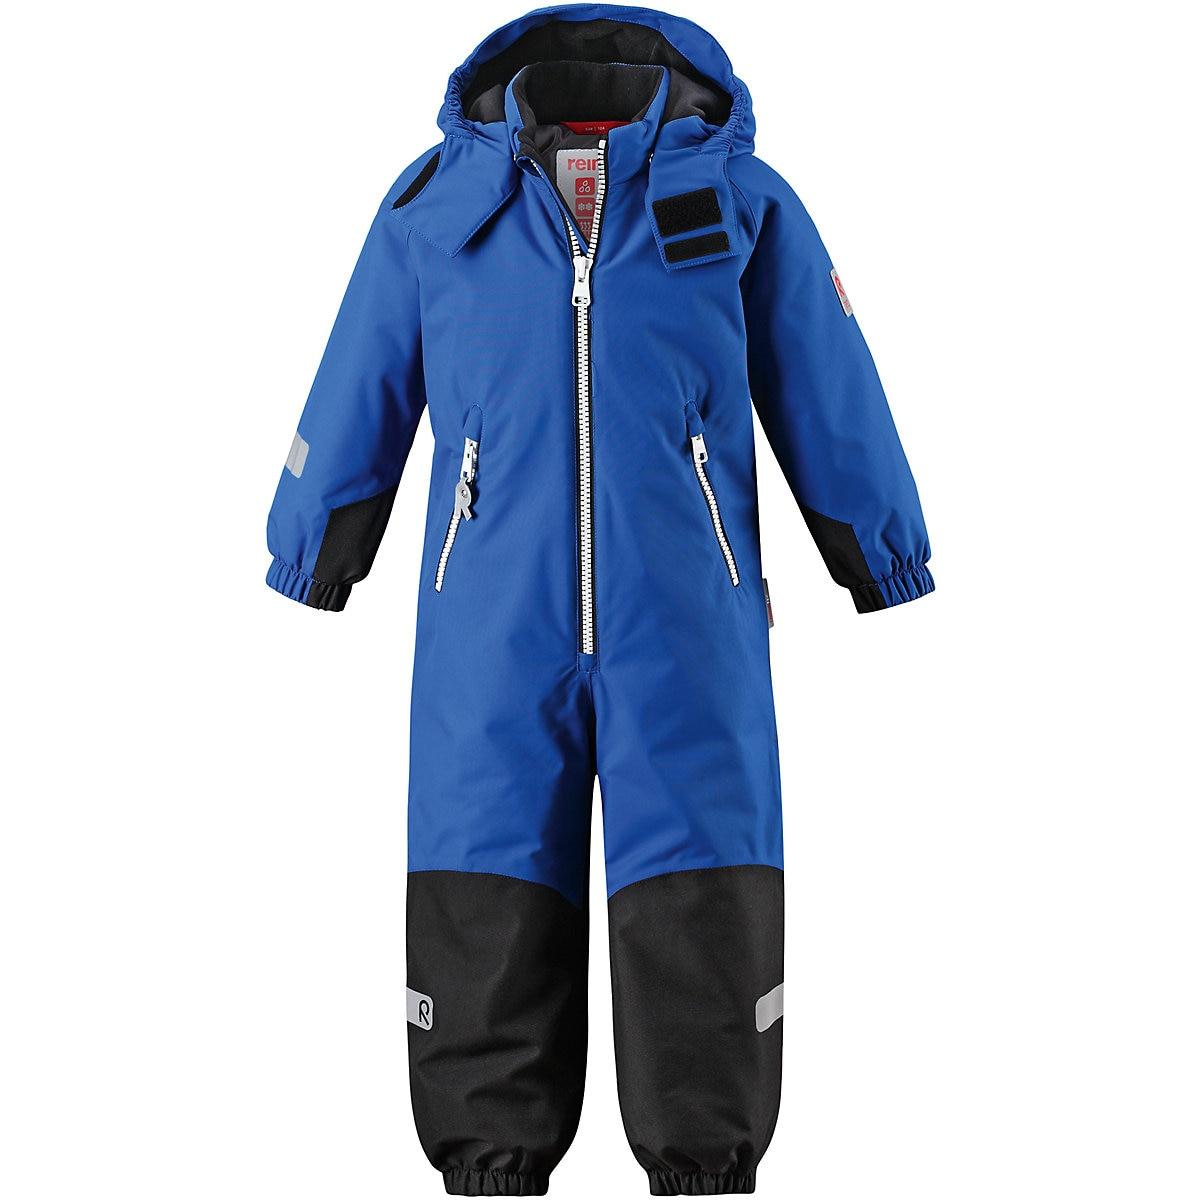 REIMA Overalls  8689102 for boys polyester winter reima overalls 7628261 for boys and girls polyester winter